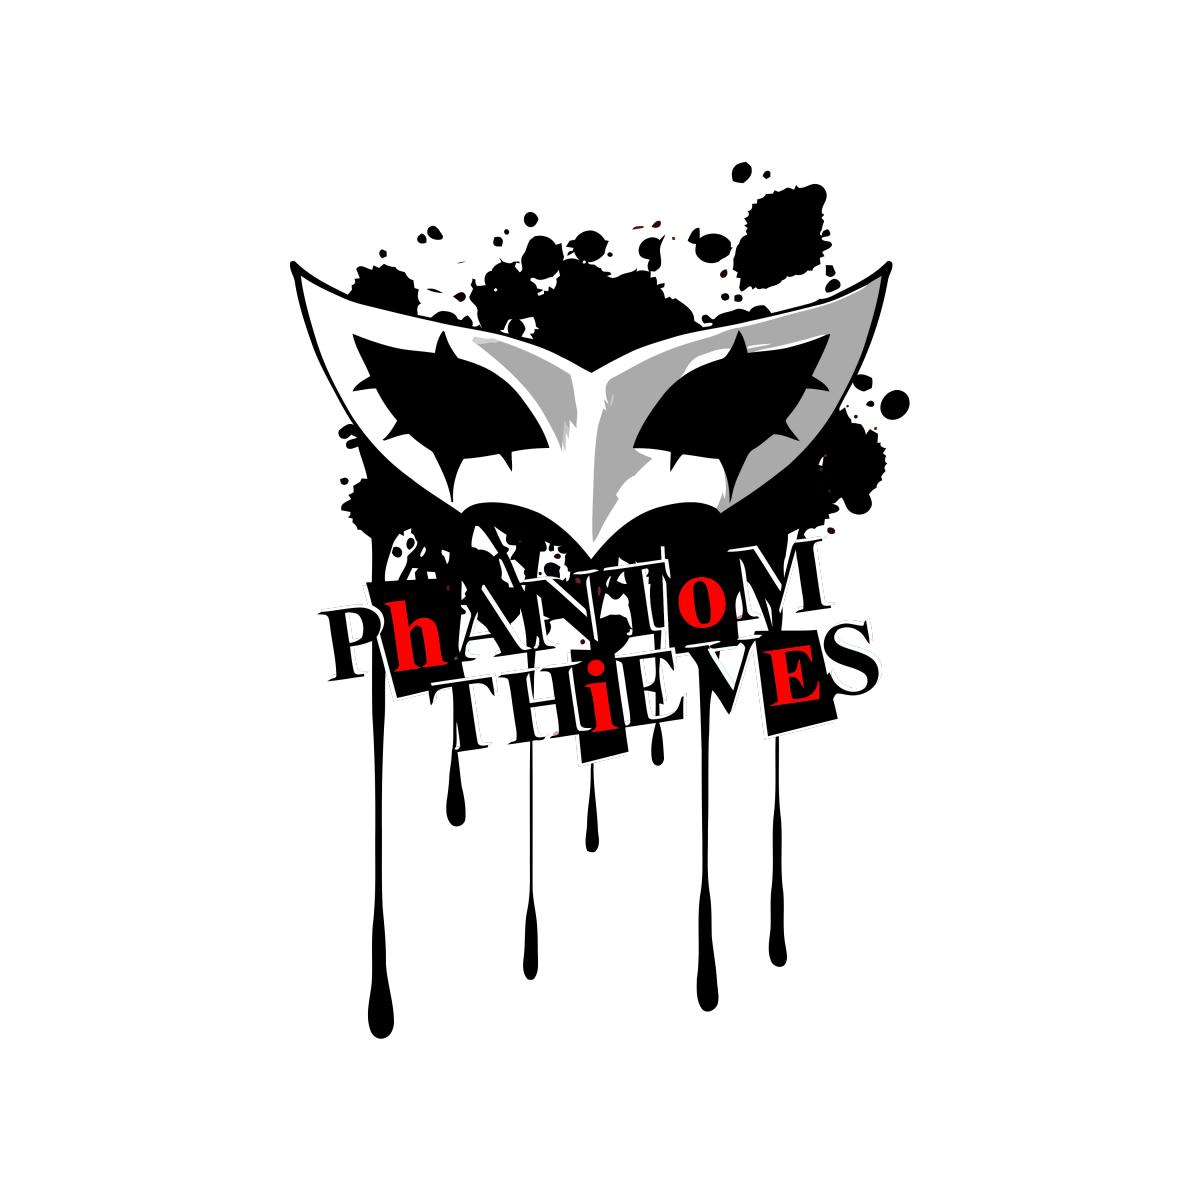 P5 Phantom Thieves Leondhardin S Artist Shop Persona 5 Anime Persona 5 Joker Persona 5